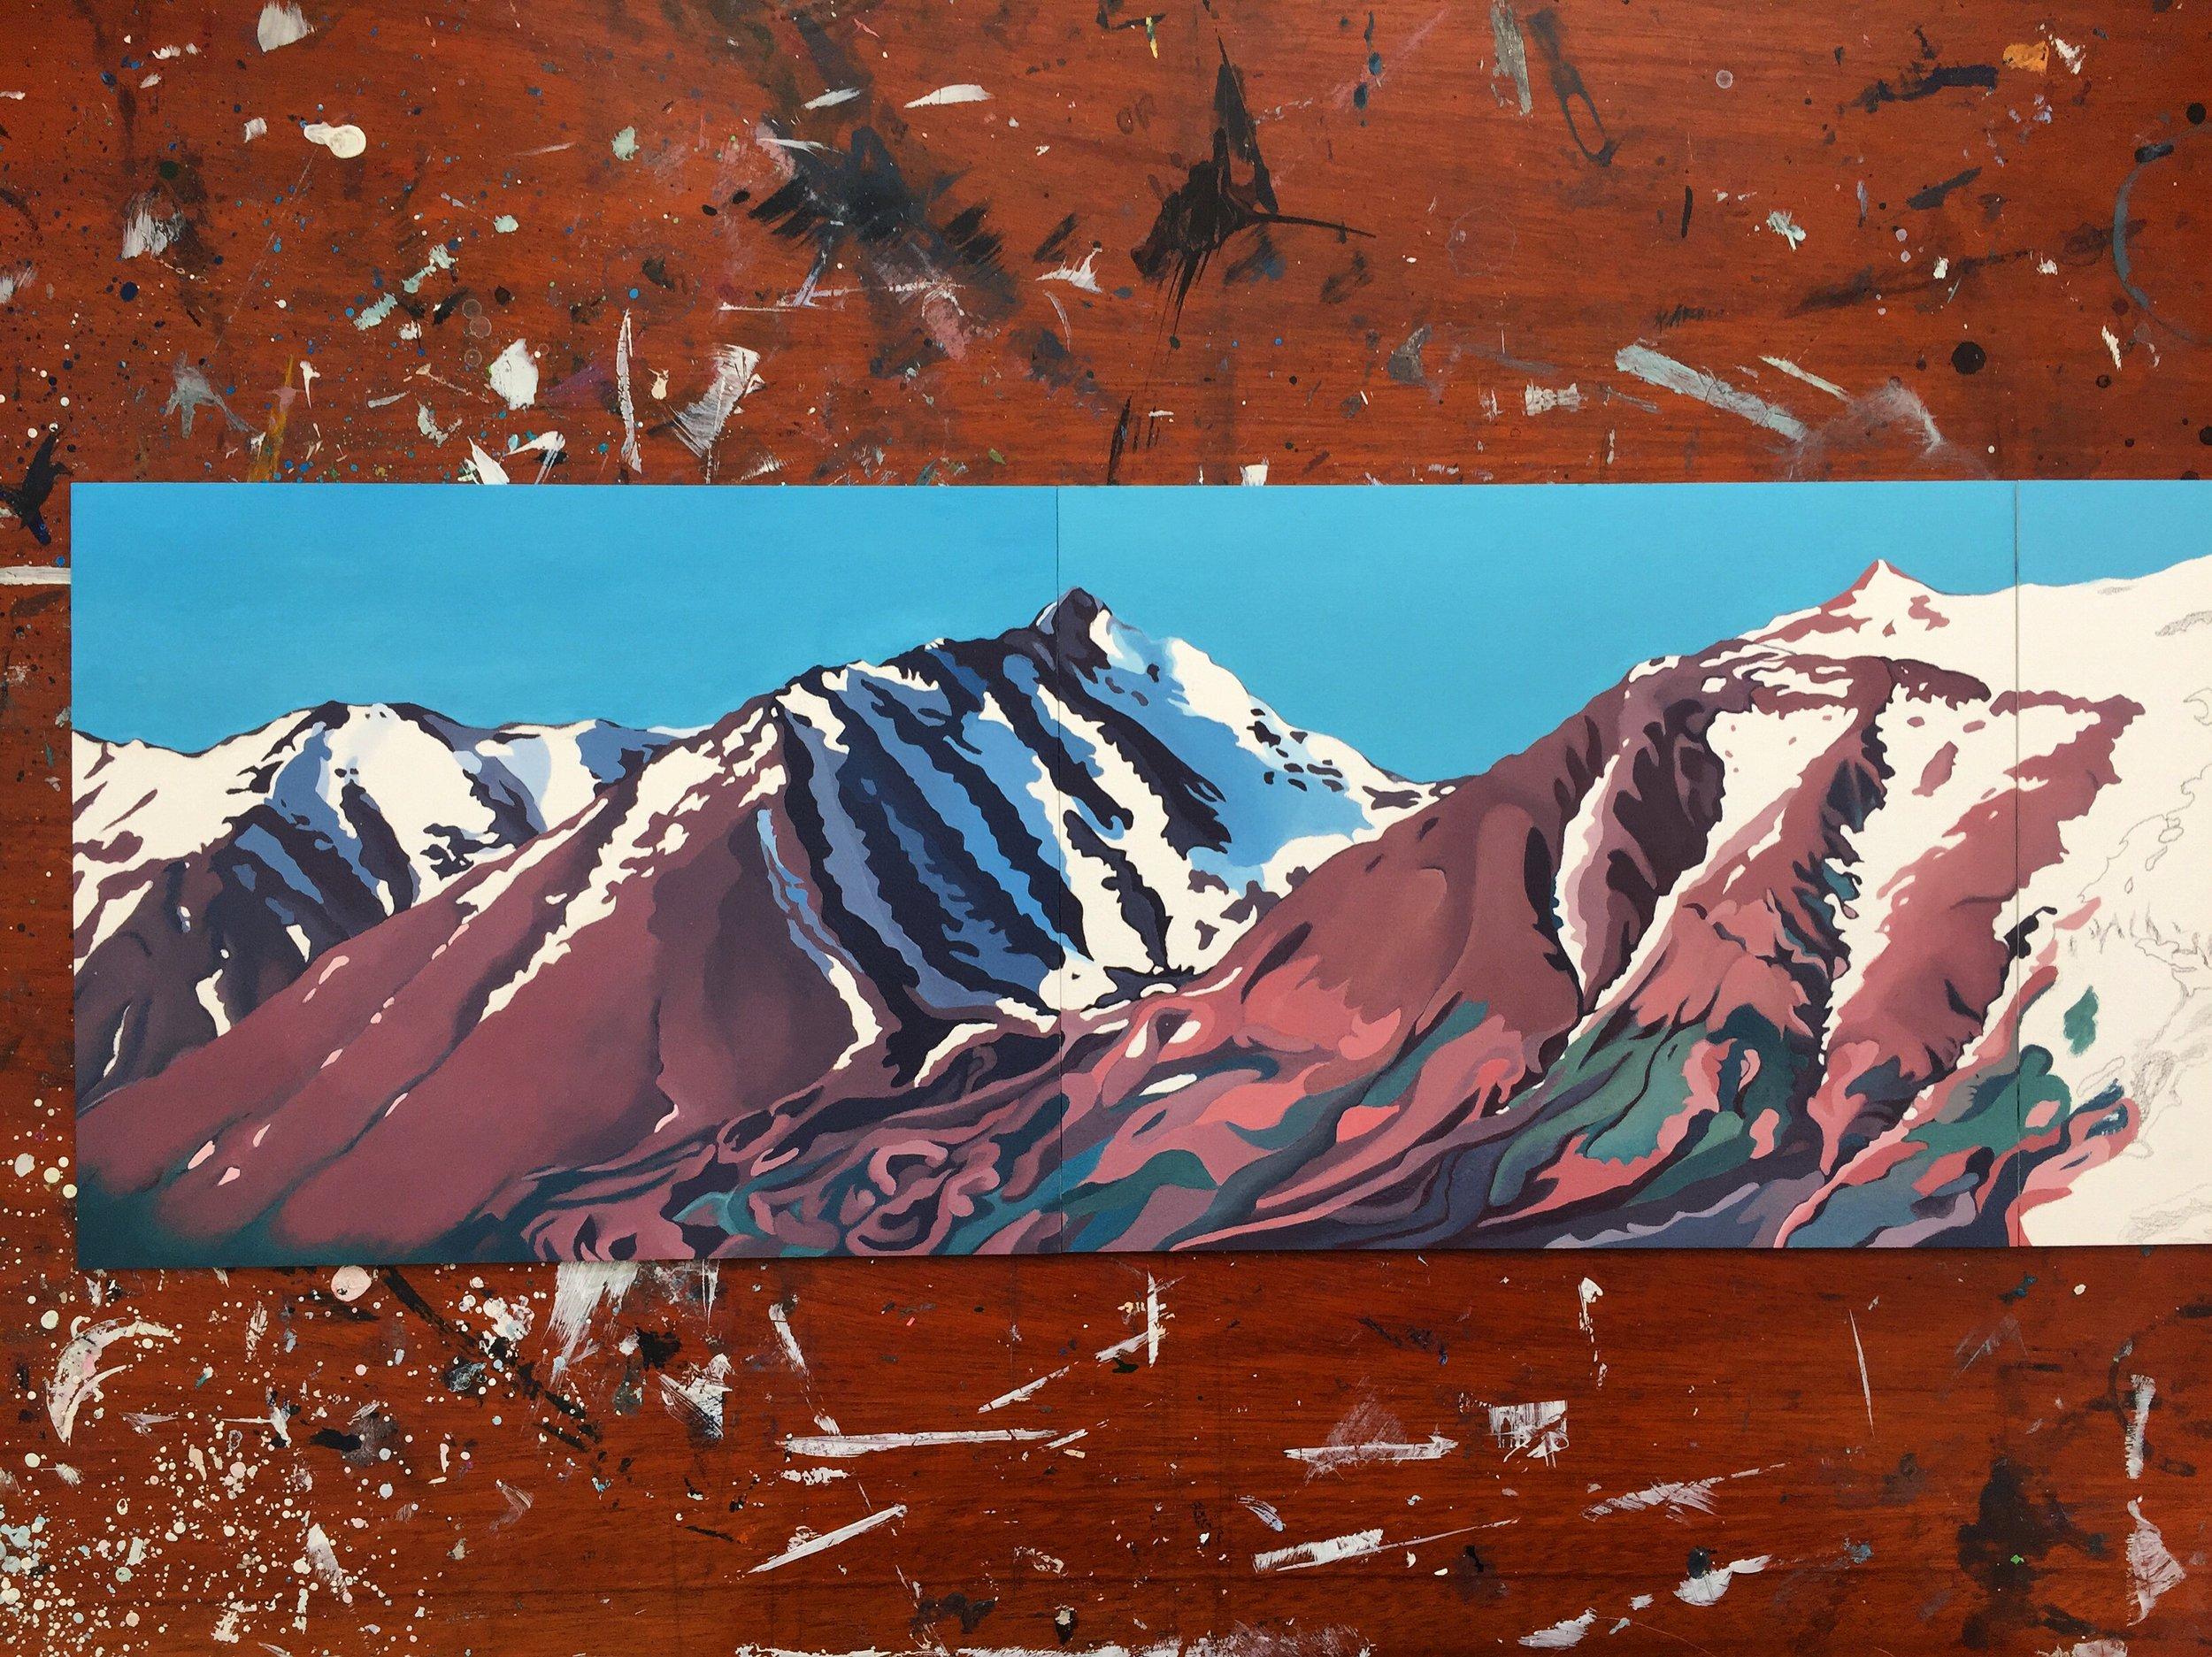 Hrisey mountains - Triptych, work in progress